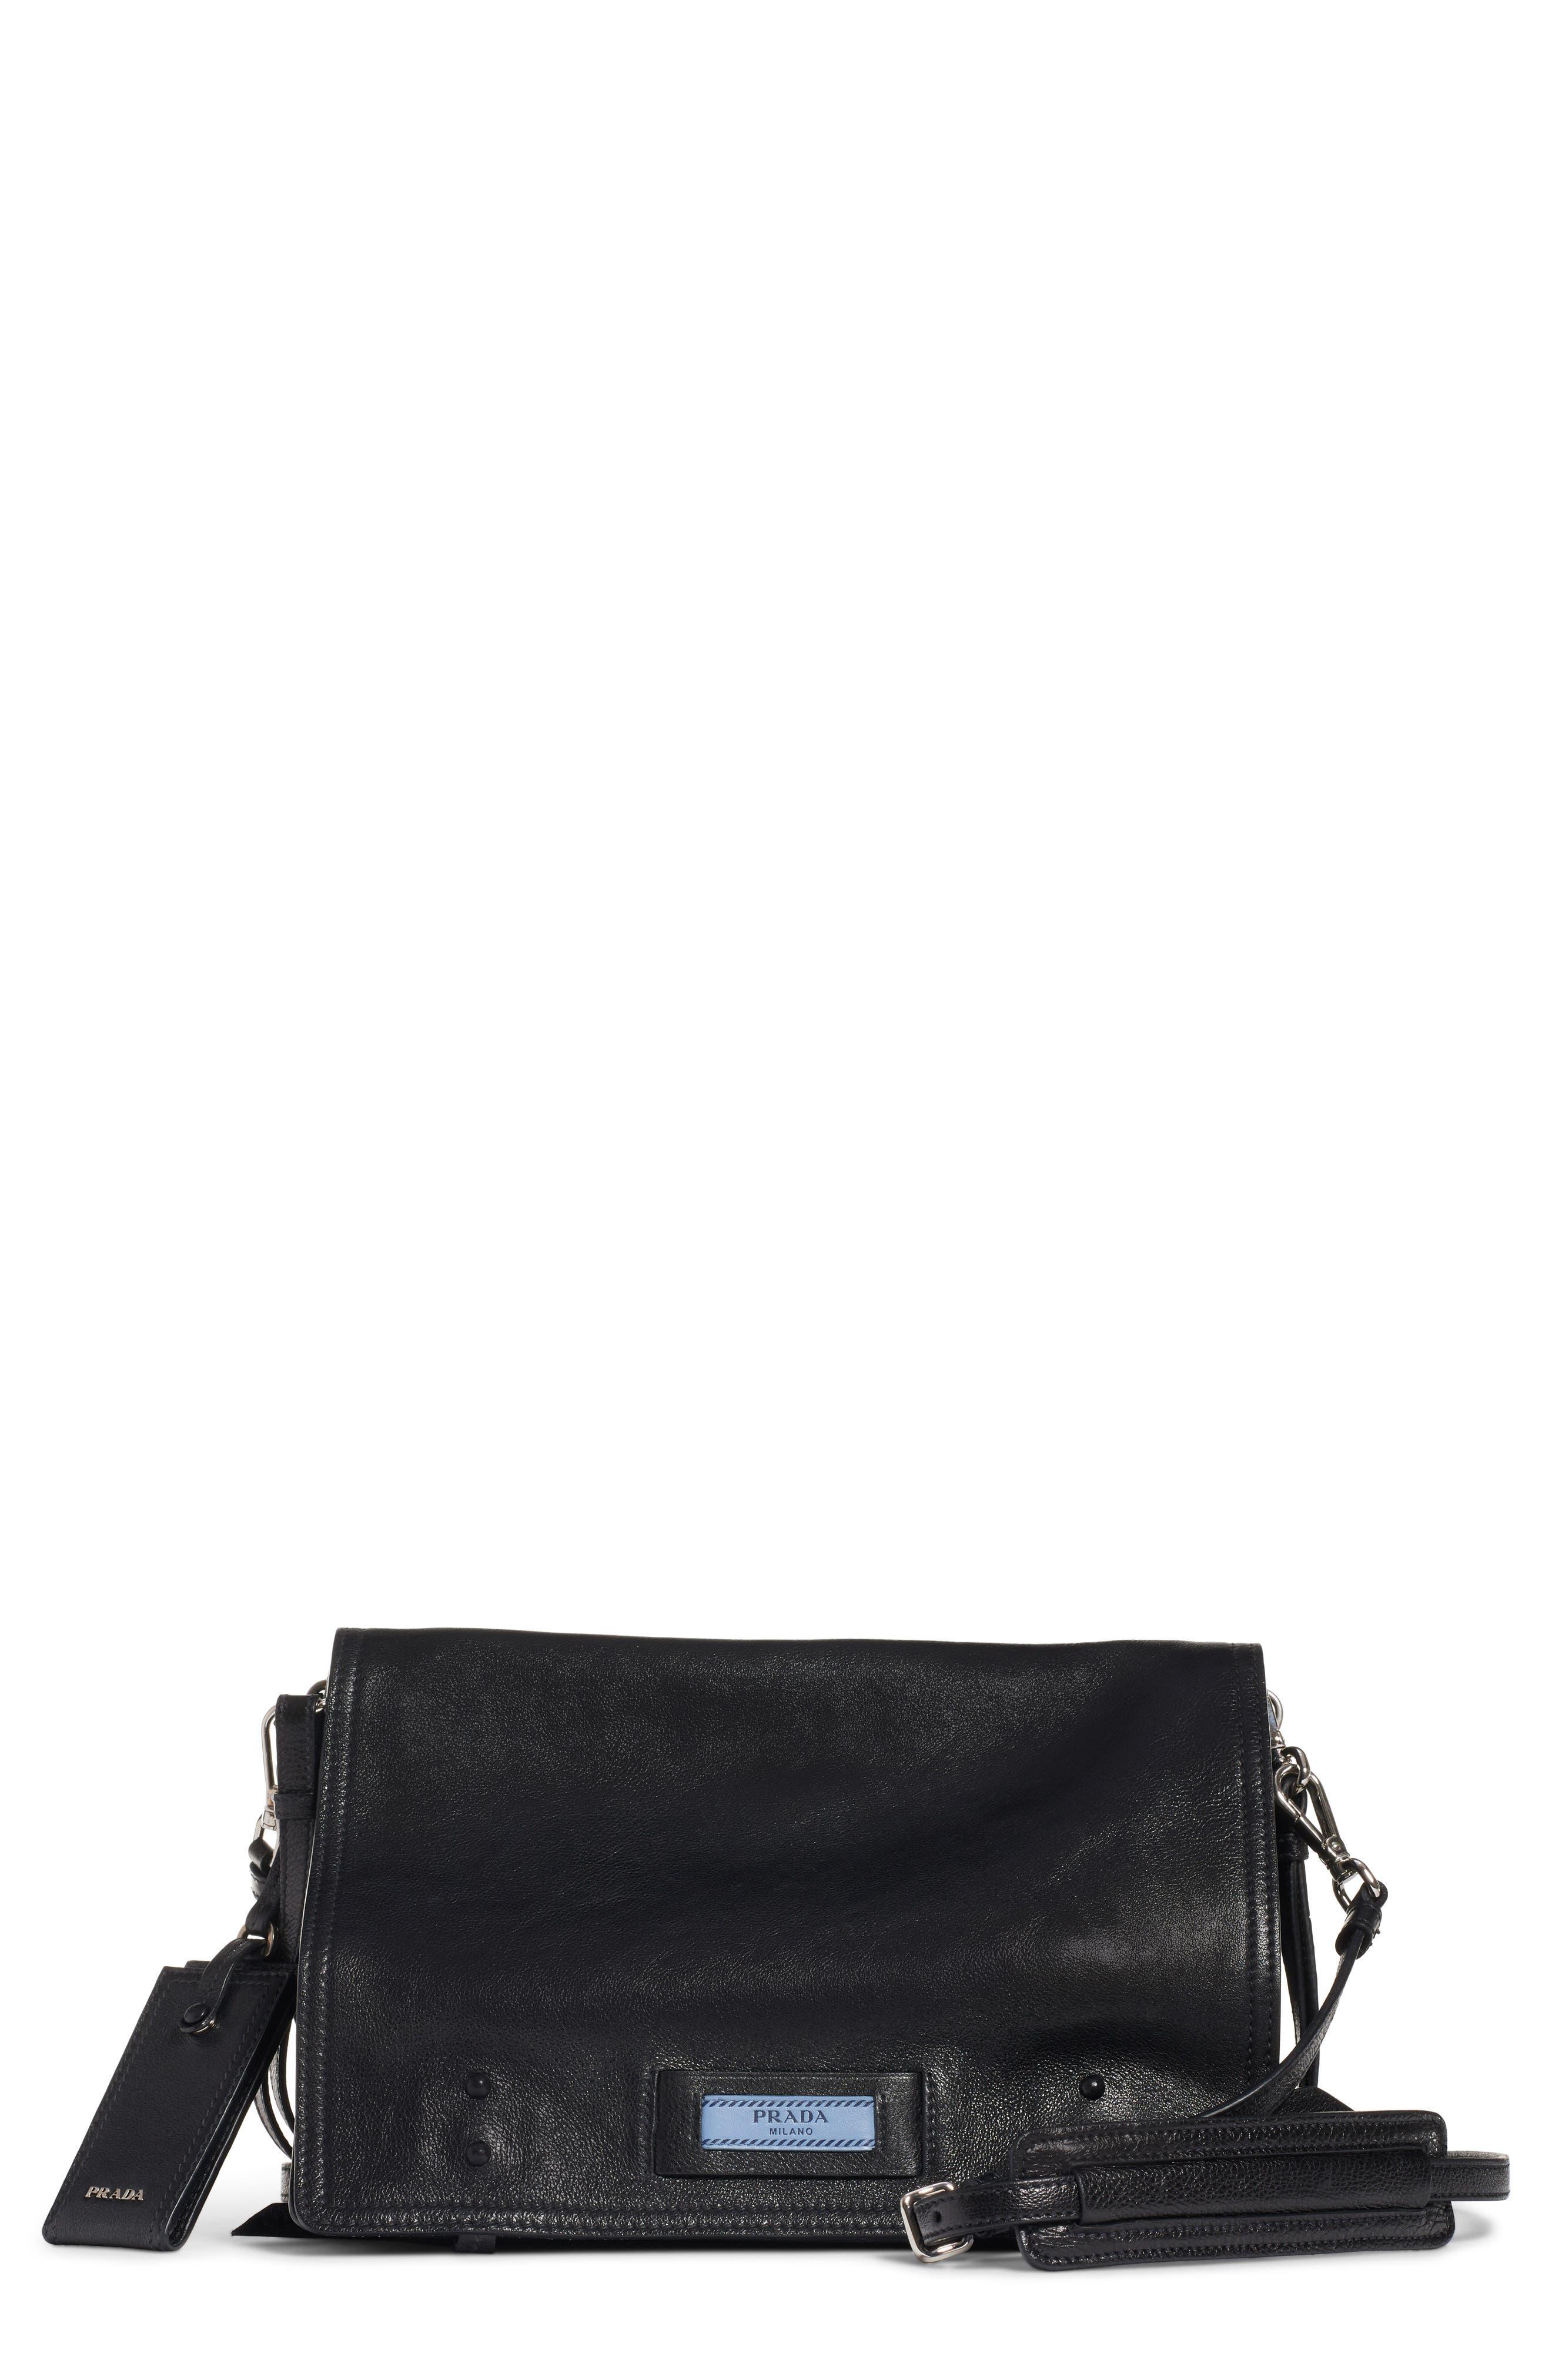 PRADA,                             Medium Etiquette Shoulder Bag,                             Main thumbnail 1, color,                             NERO/ ASTRALE